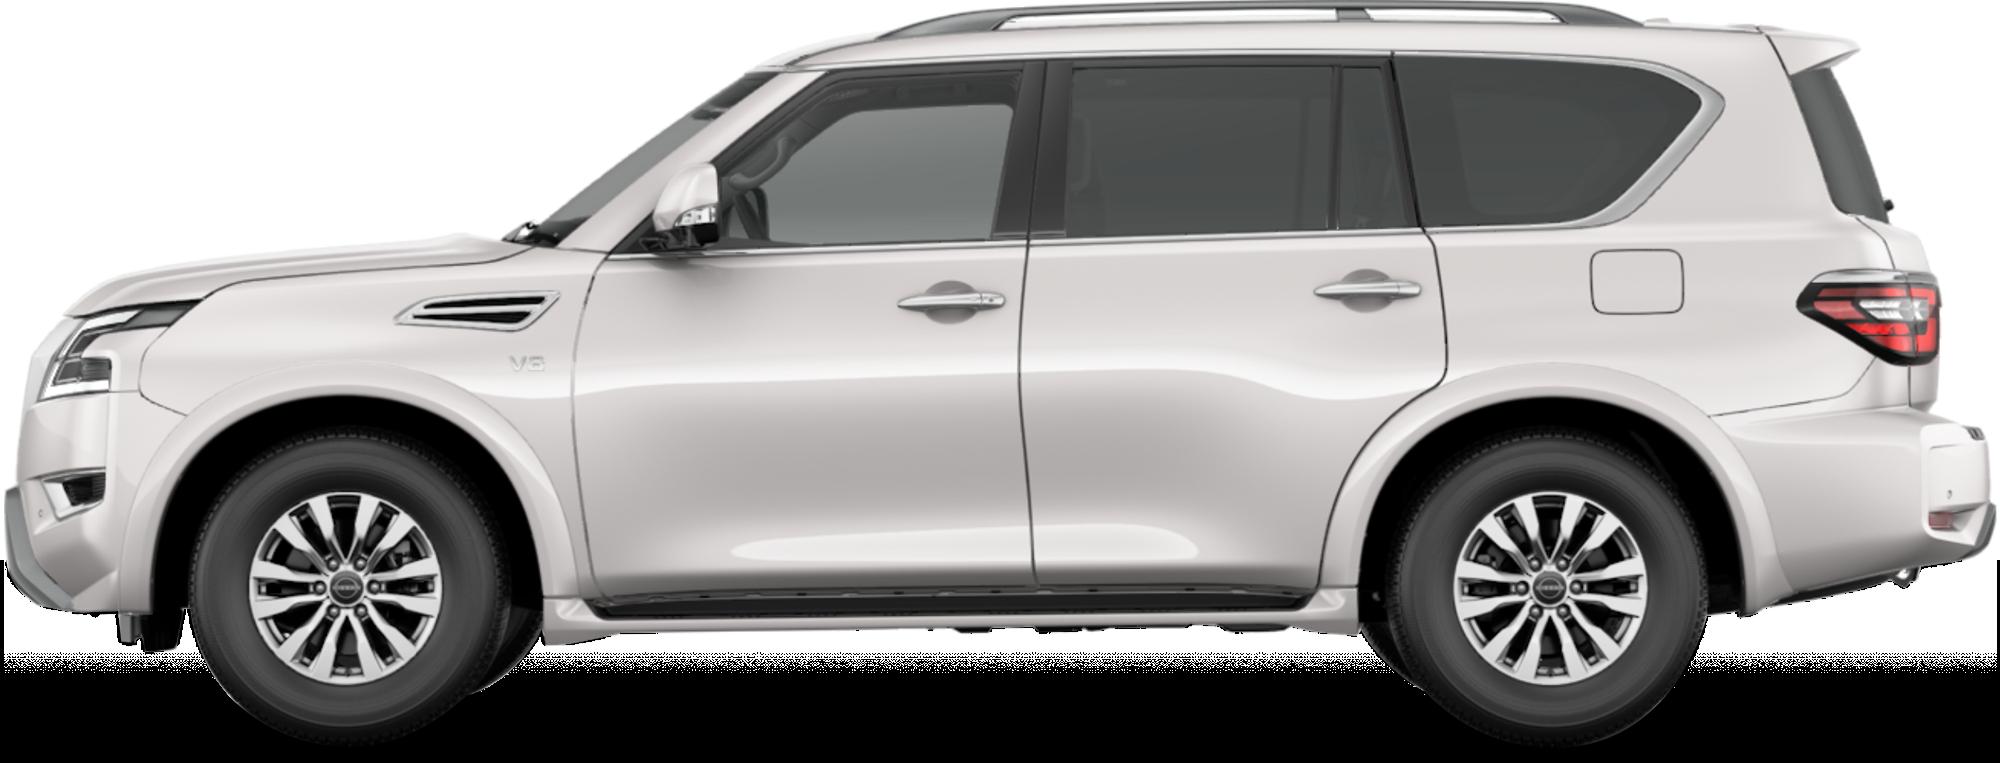 2021 Nissan Armada SUV S